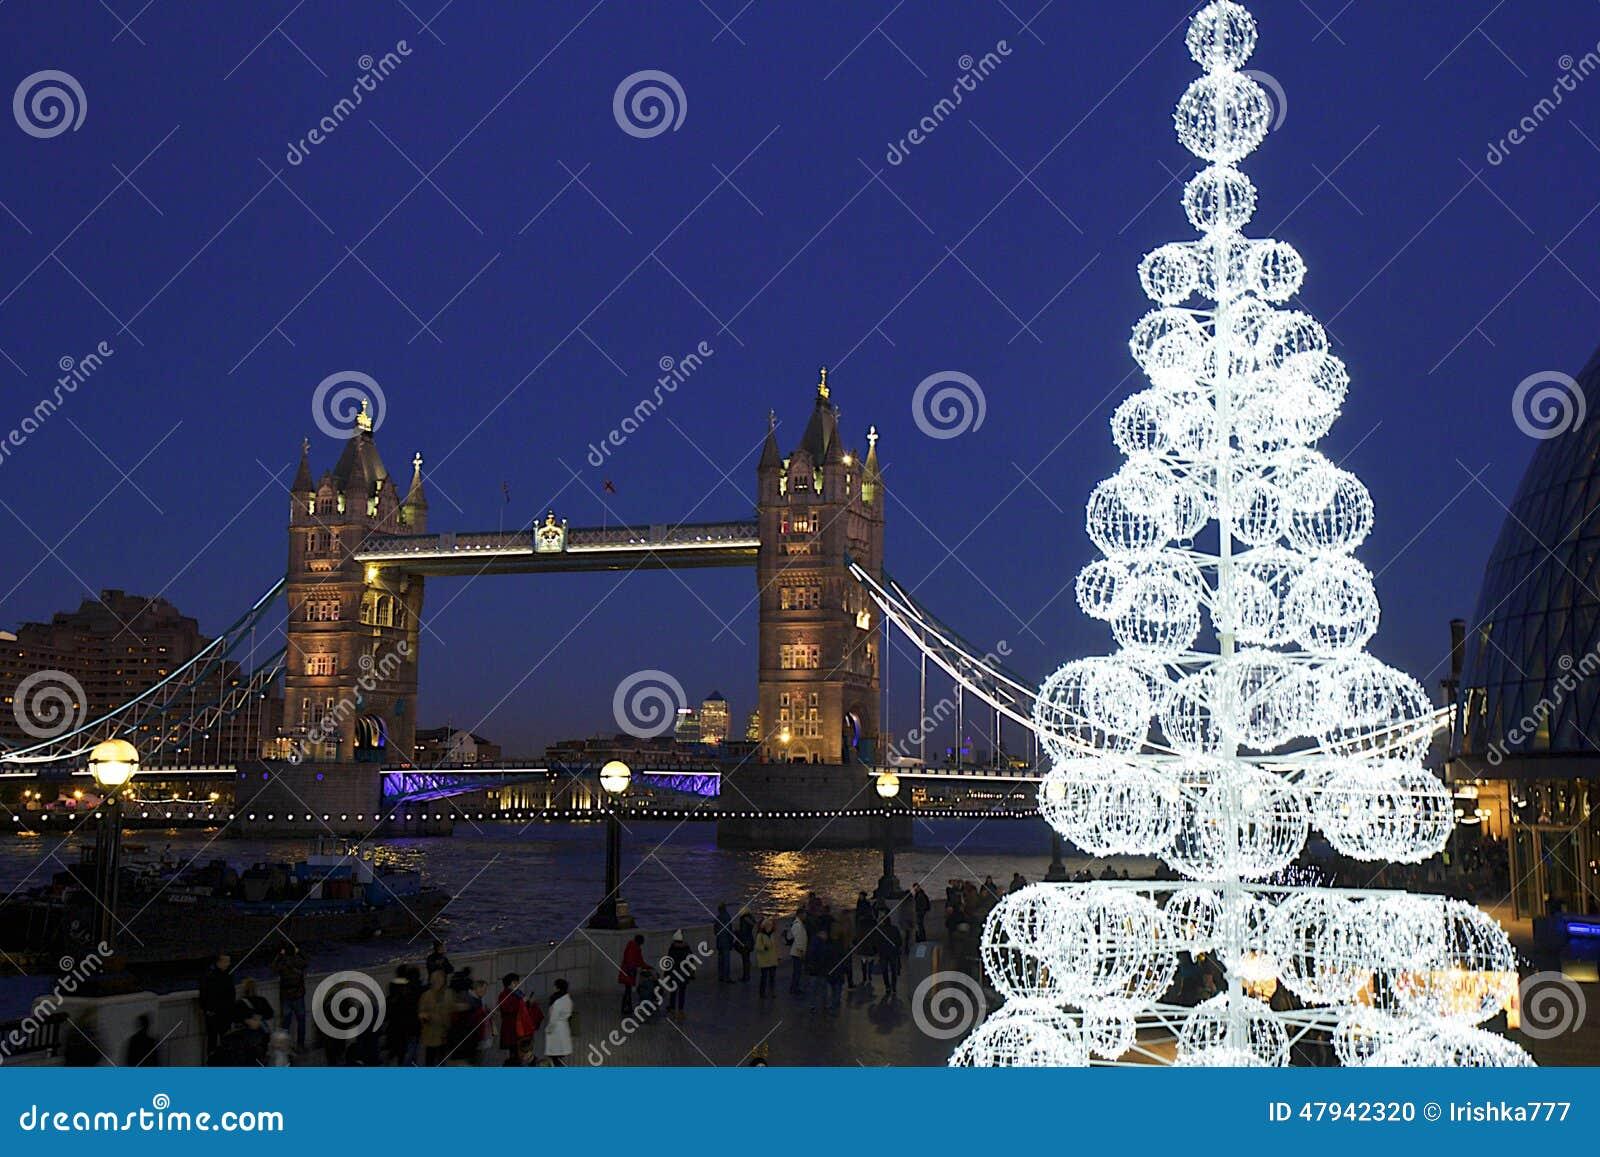 Tower Bridge At Night, London Editorial Image - Image ...